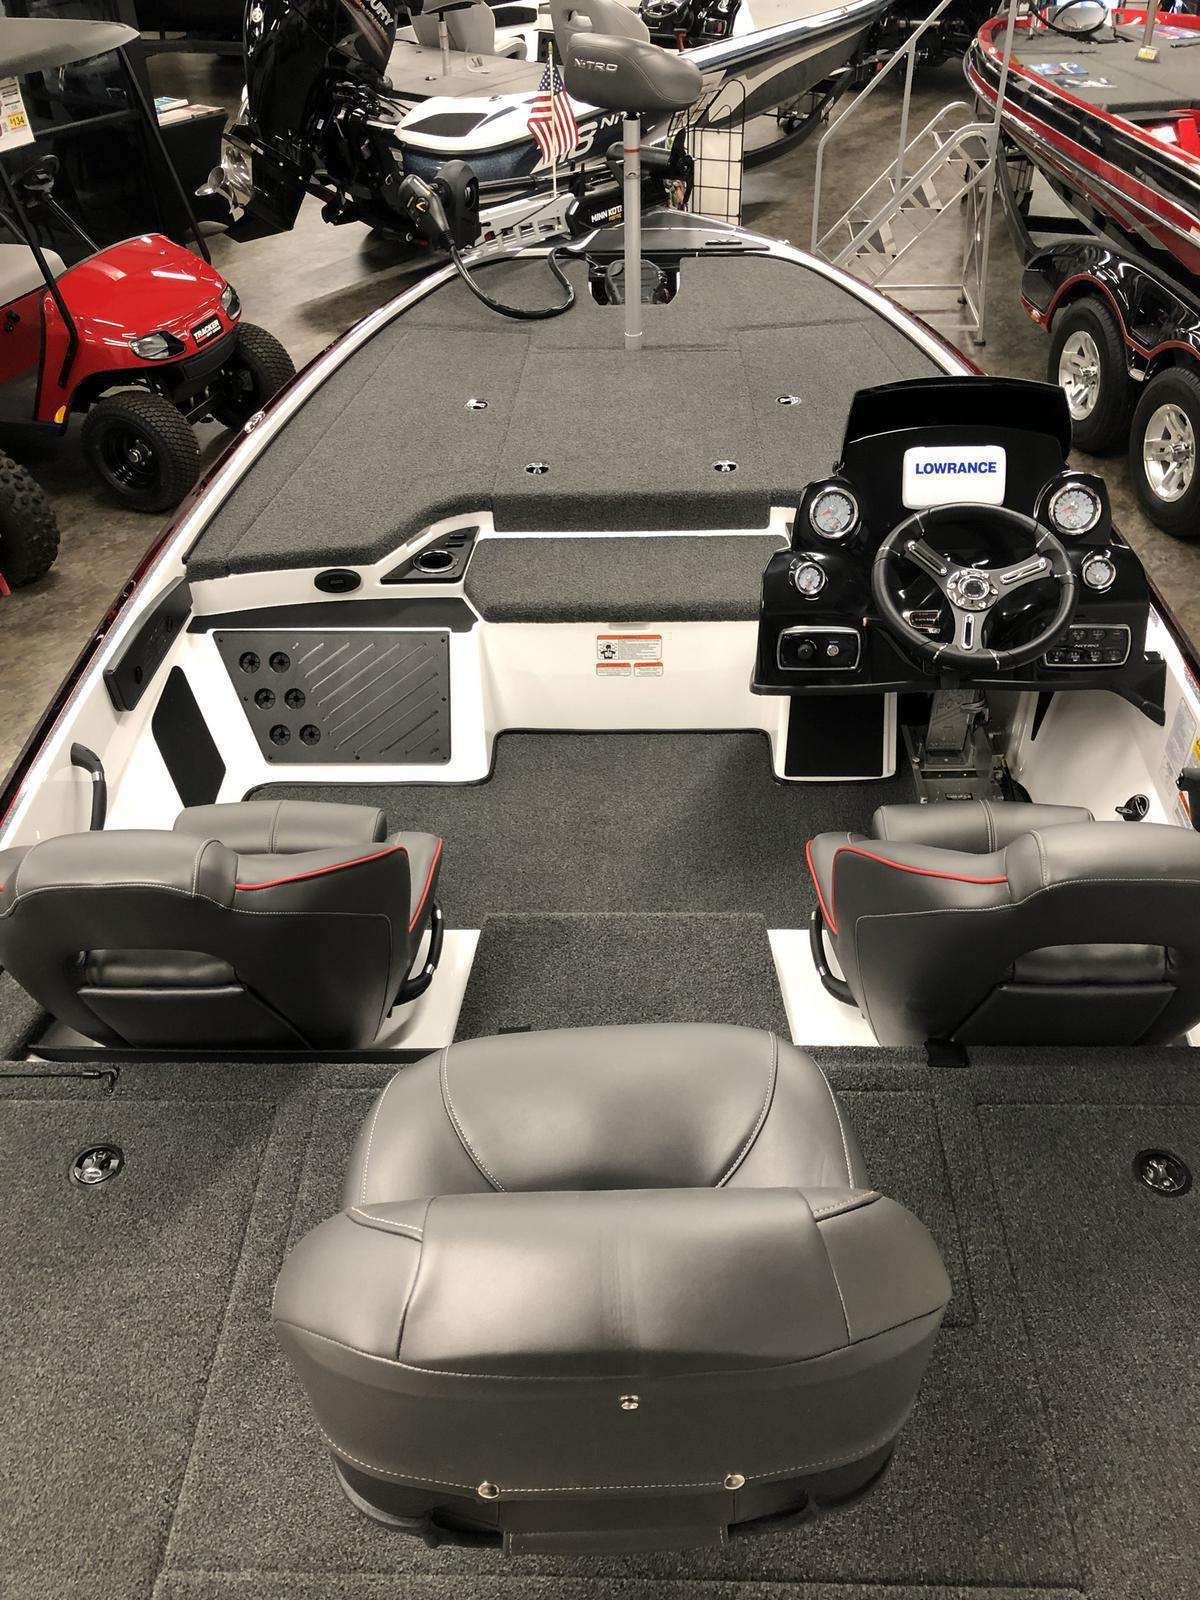 2019 Nitro boat for sale, model of the boat is Z19 & Image # 24 of 39